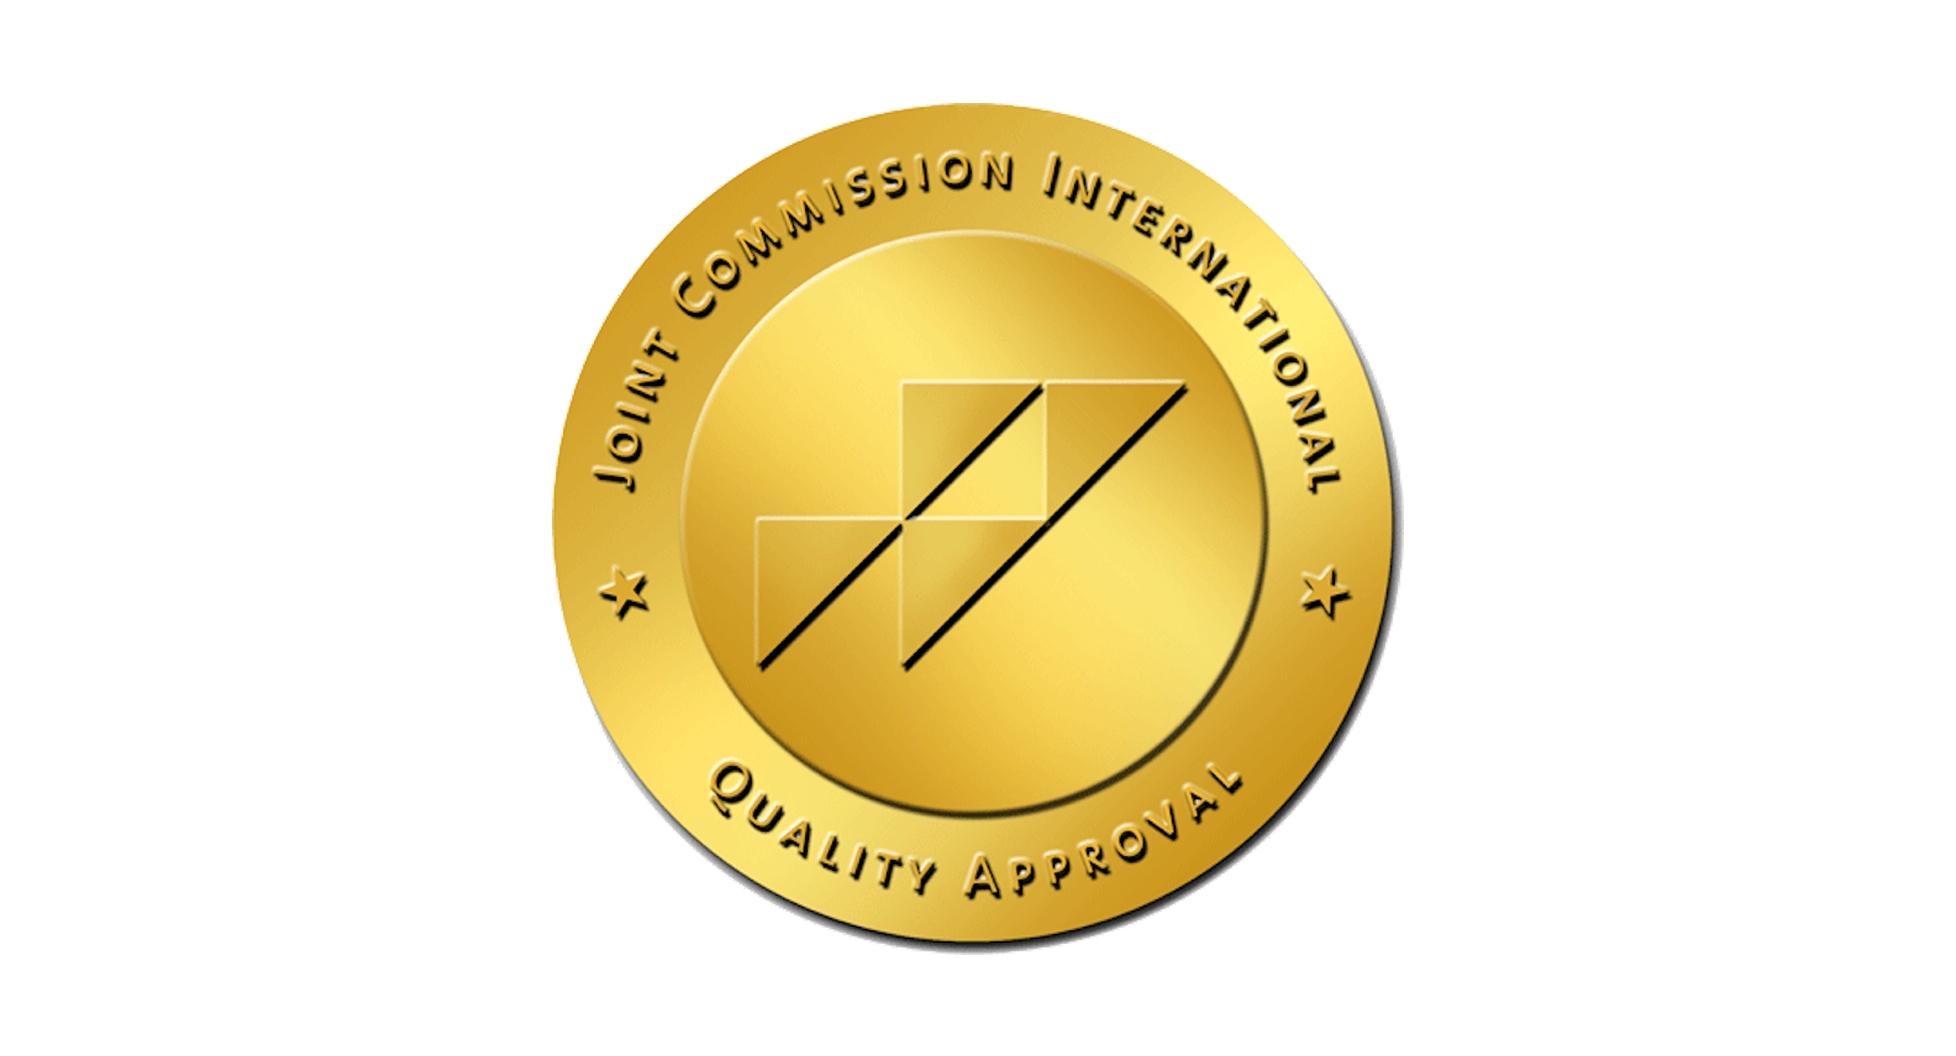 JCI (Joint Commission International)